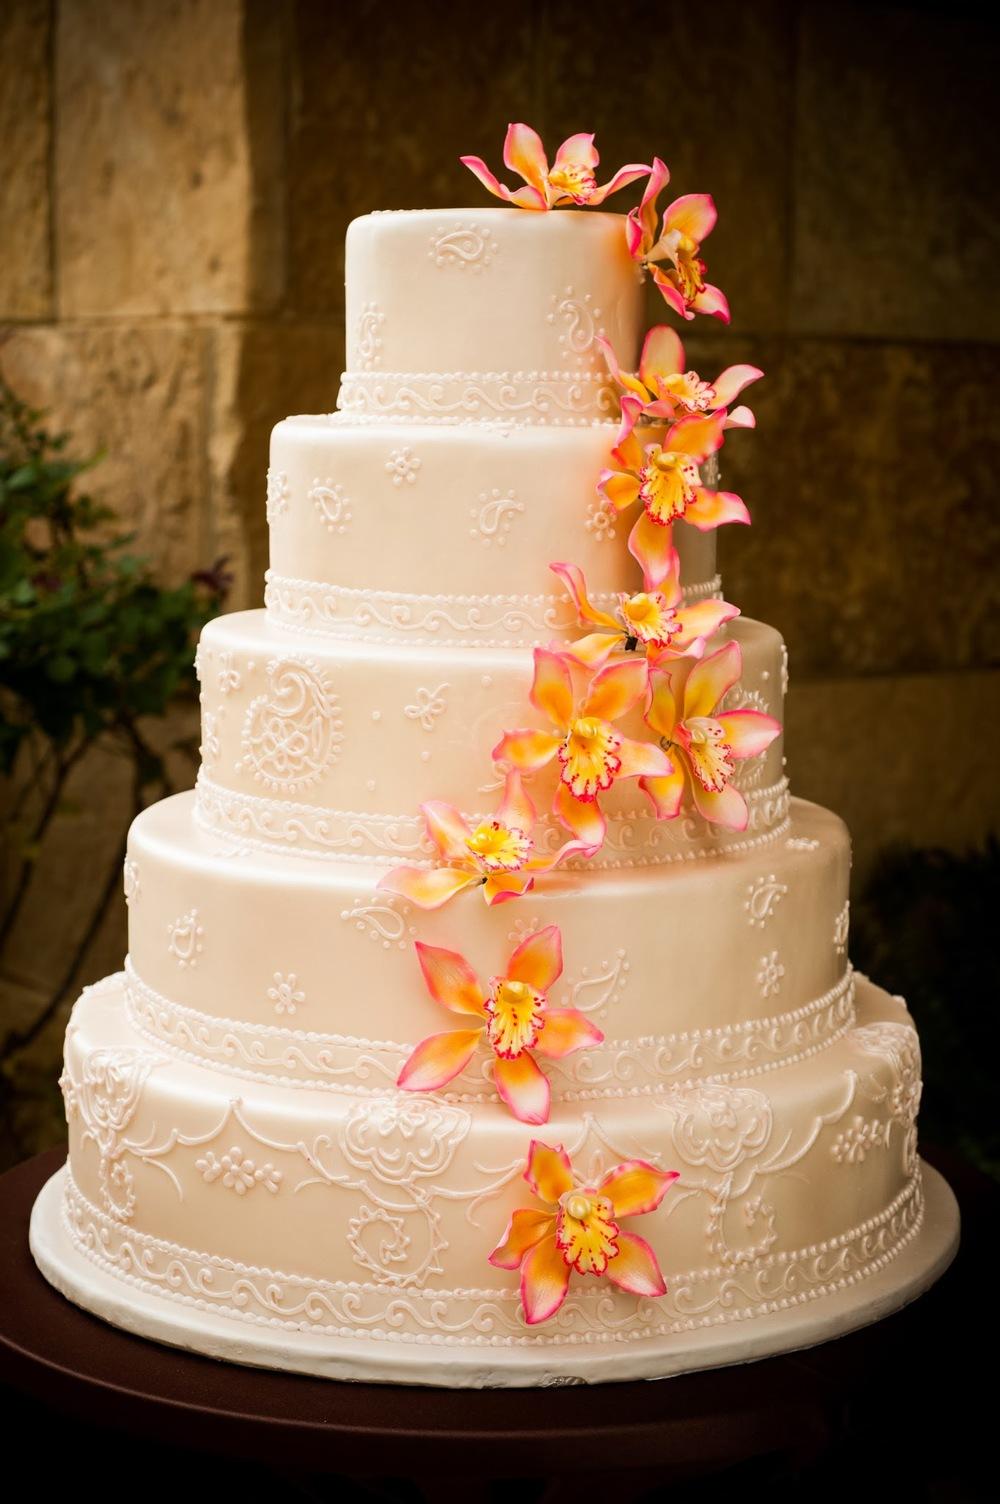 Sugar Flowers Wedding Cake | Edible Art Bakery of Raleigh